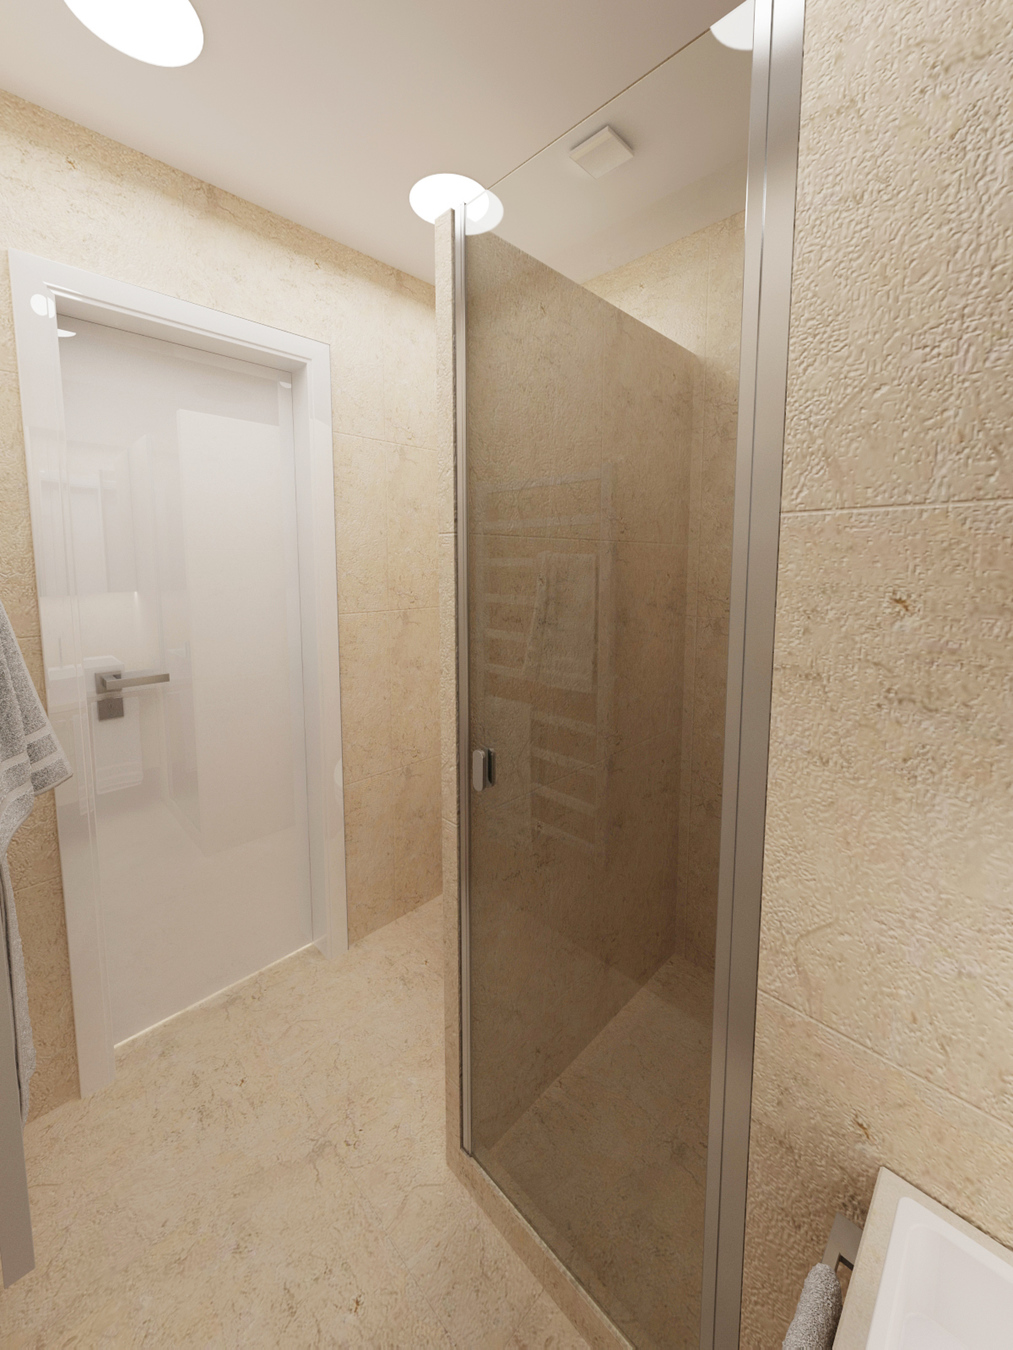 kolar_lubor_WC koupelna 030000